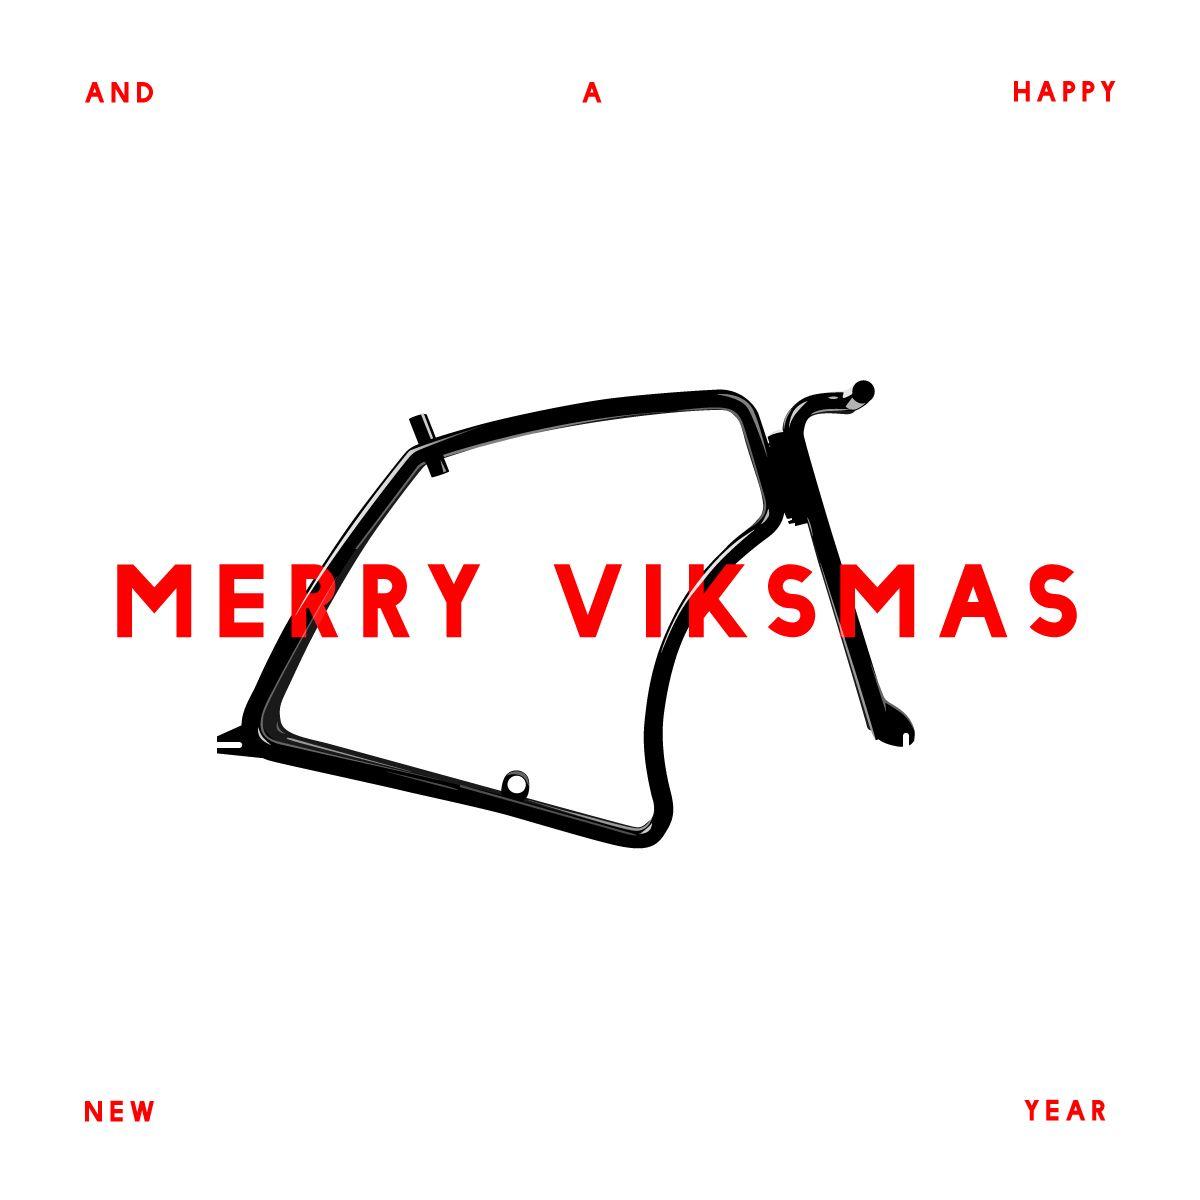 Merry Vixmas